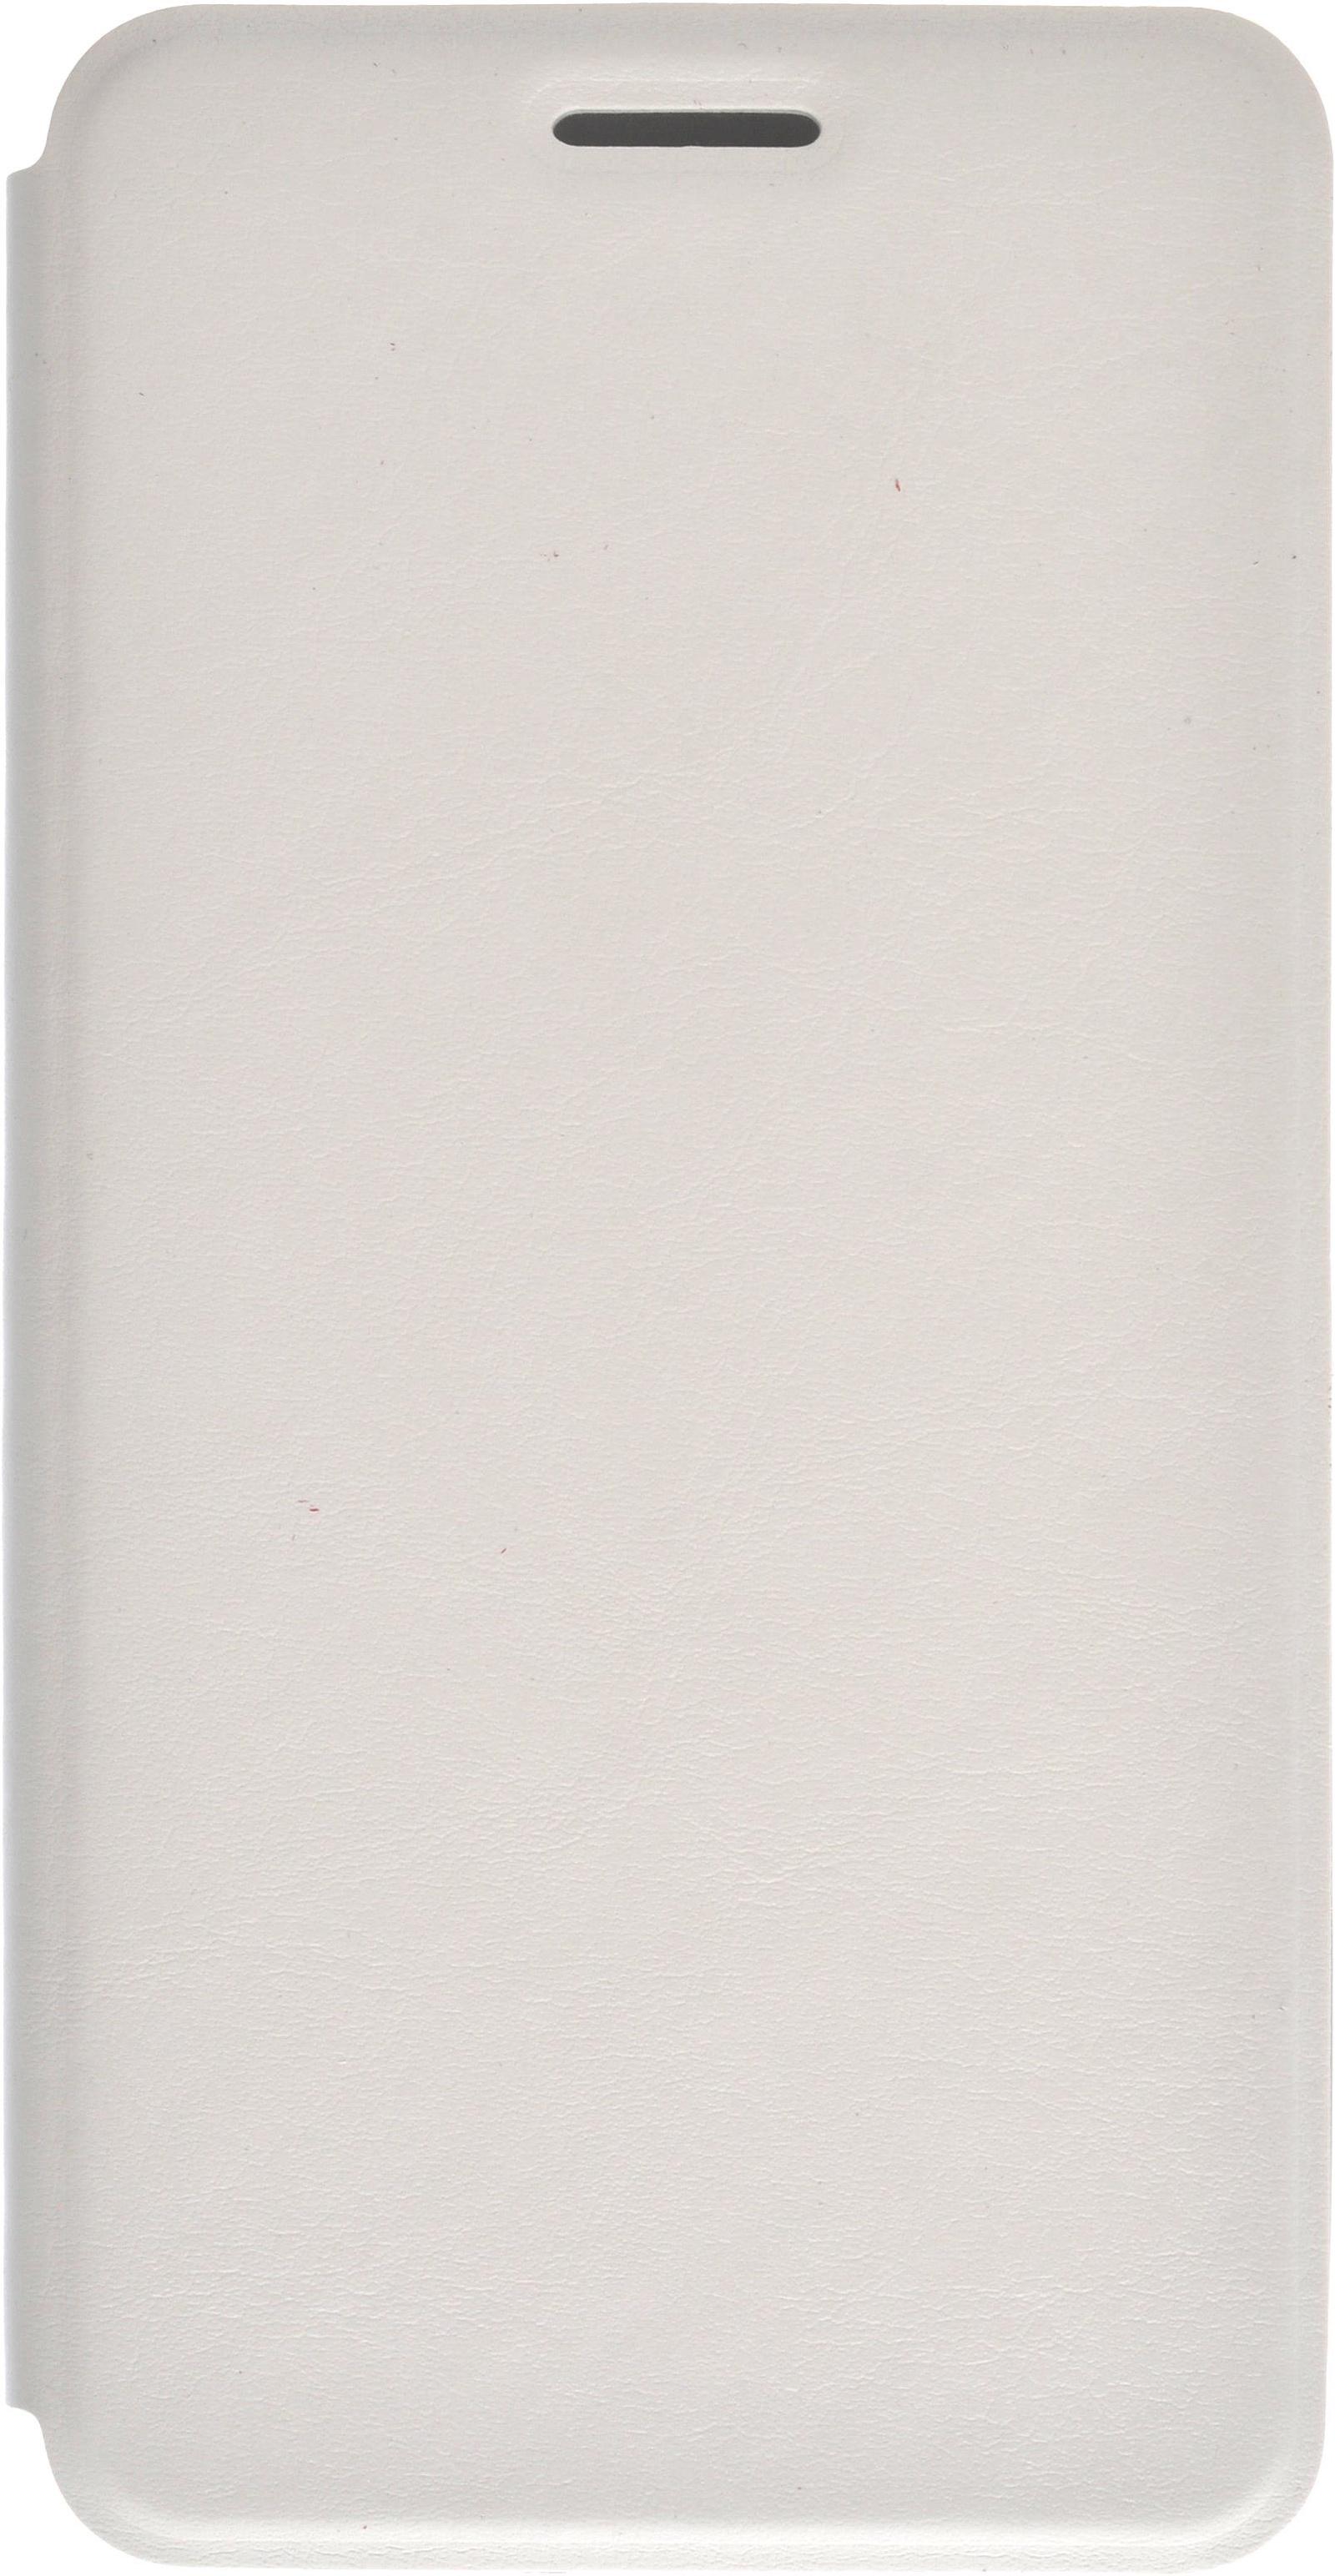 Чехол для сотового телефона skinBOX Lux, 4630042527294, белый nokia cc 3096 чехол для lumia 435 532 bright orange